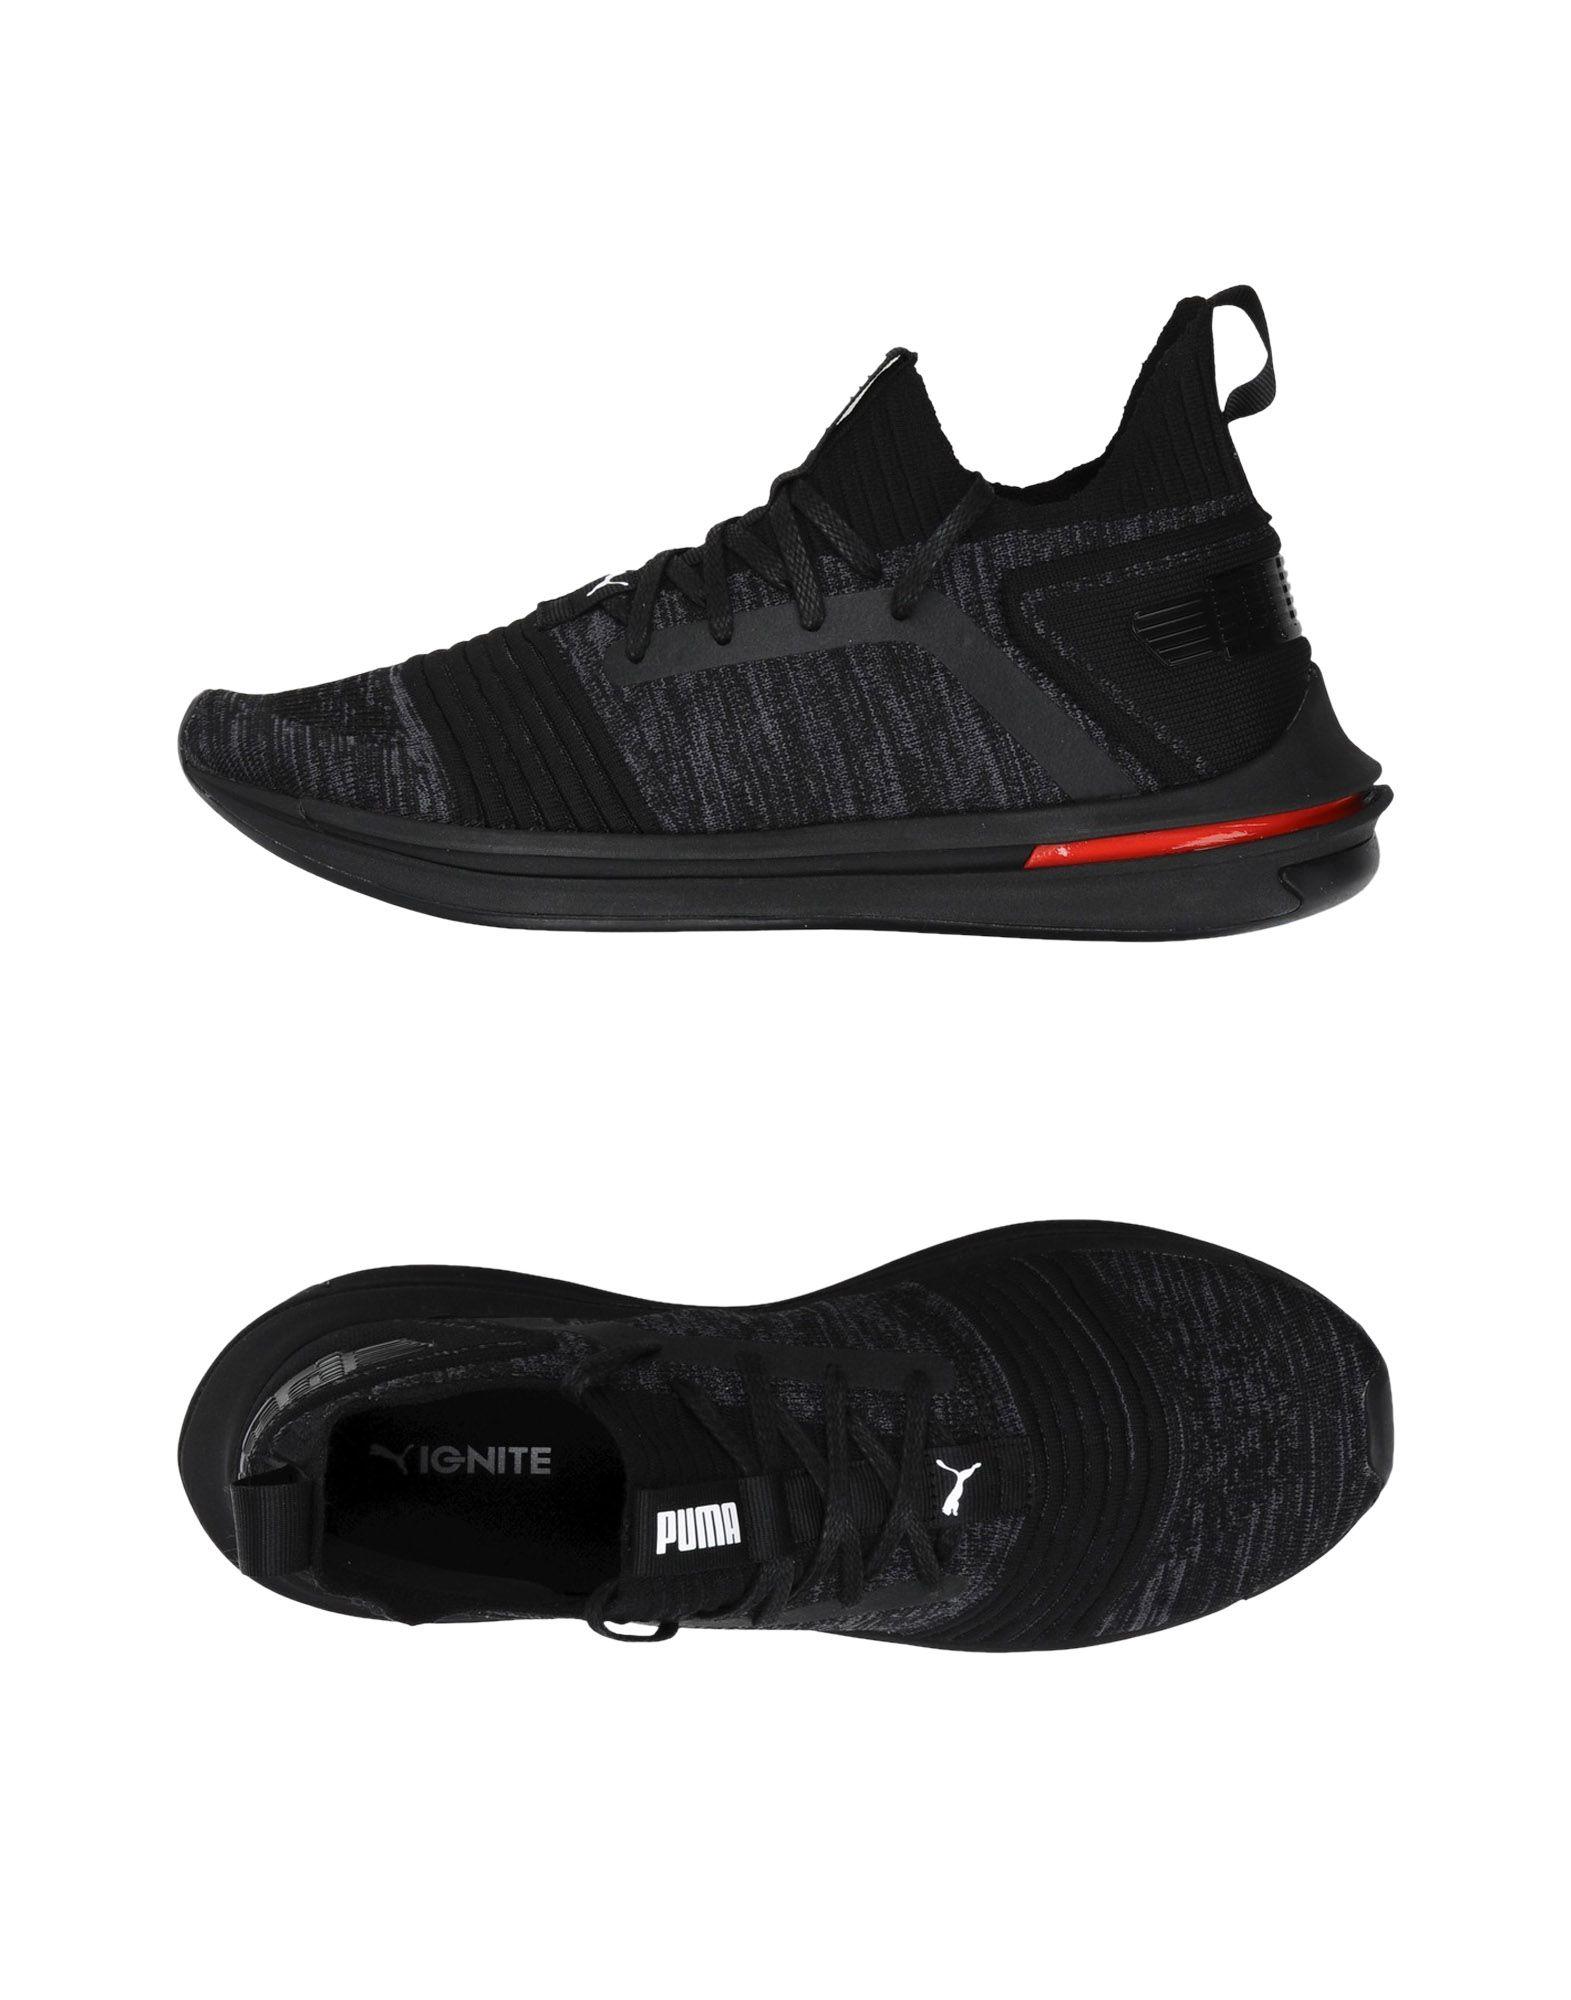 Sneakers Puma Ignite Limitless Sr Evoknit - Uomo - Acquista online su